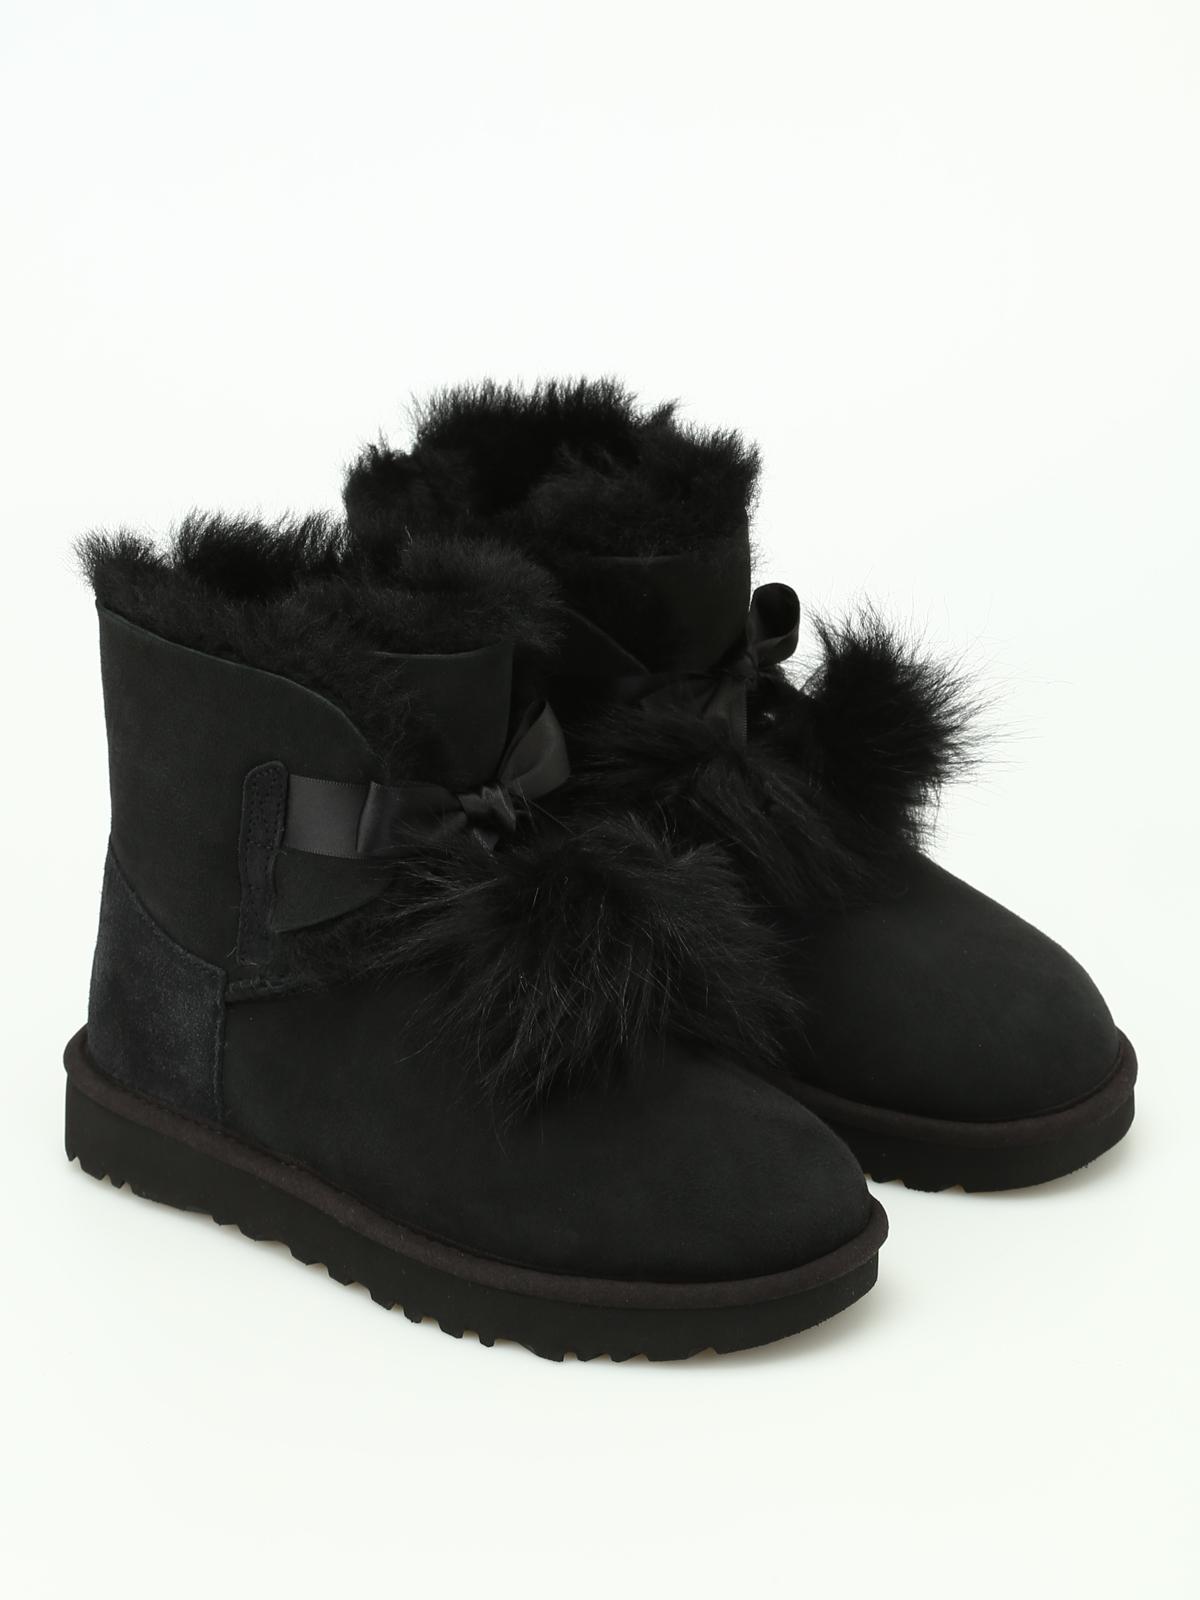 Ugg - Gita black suede booties - ankle